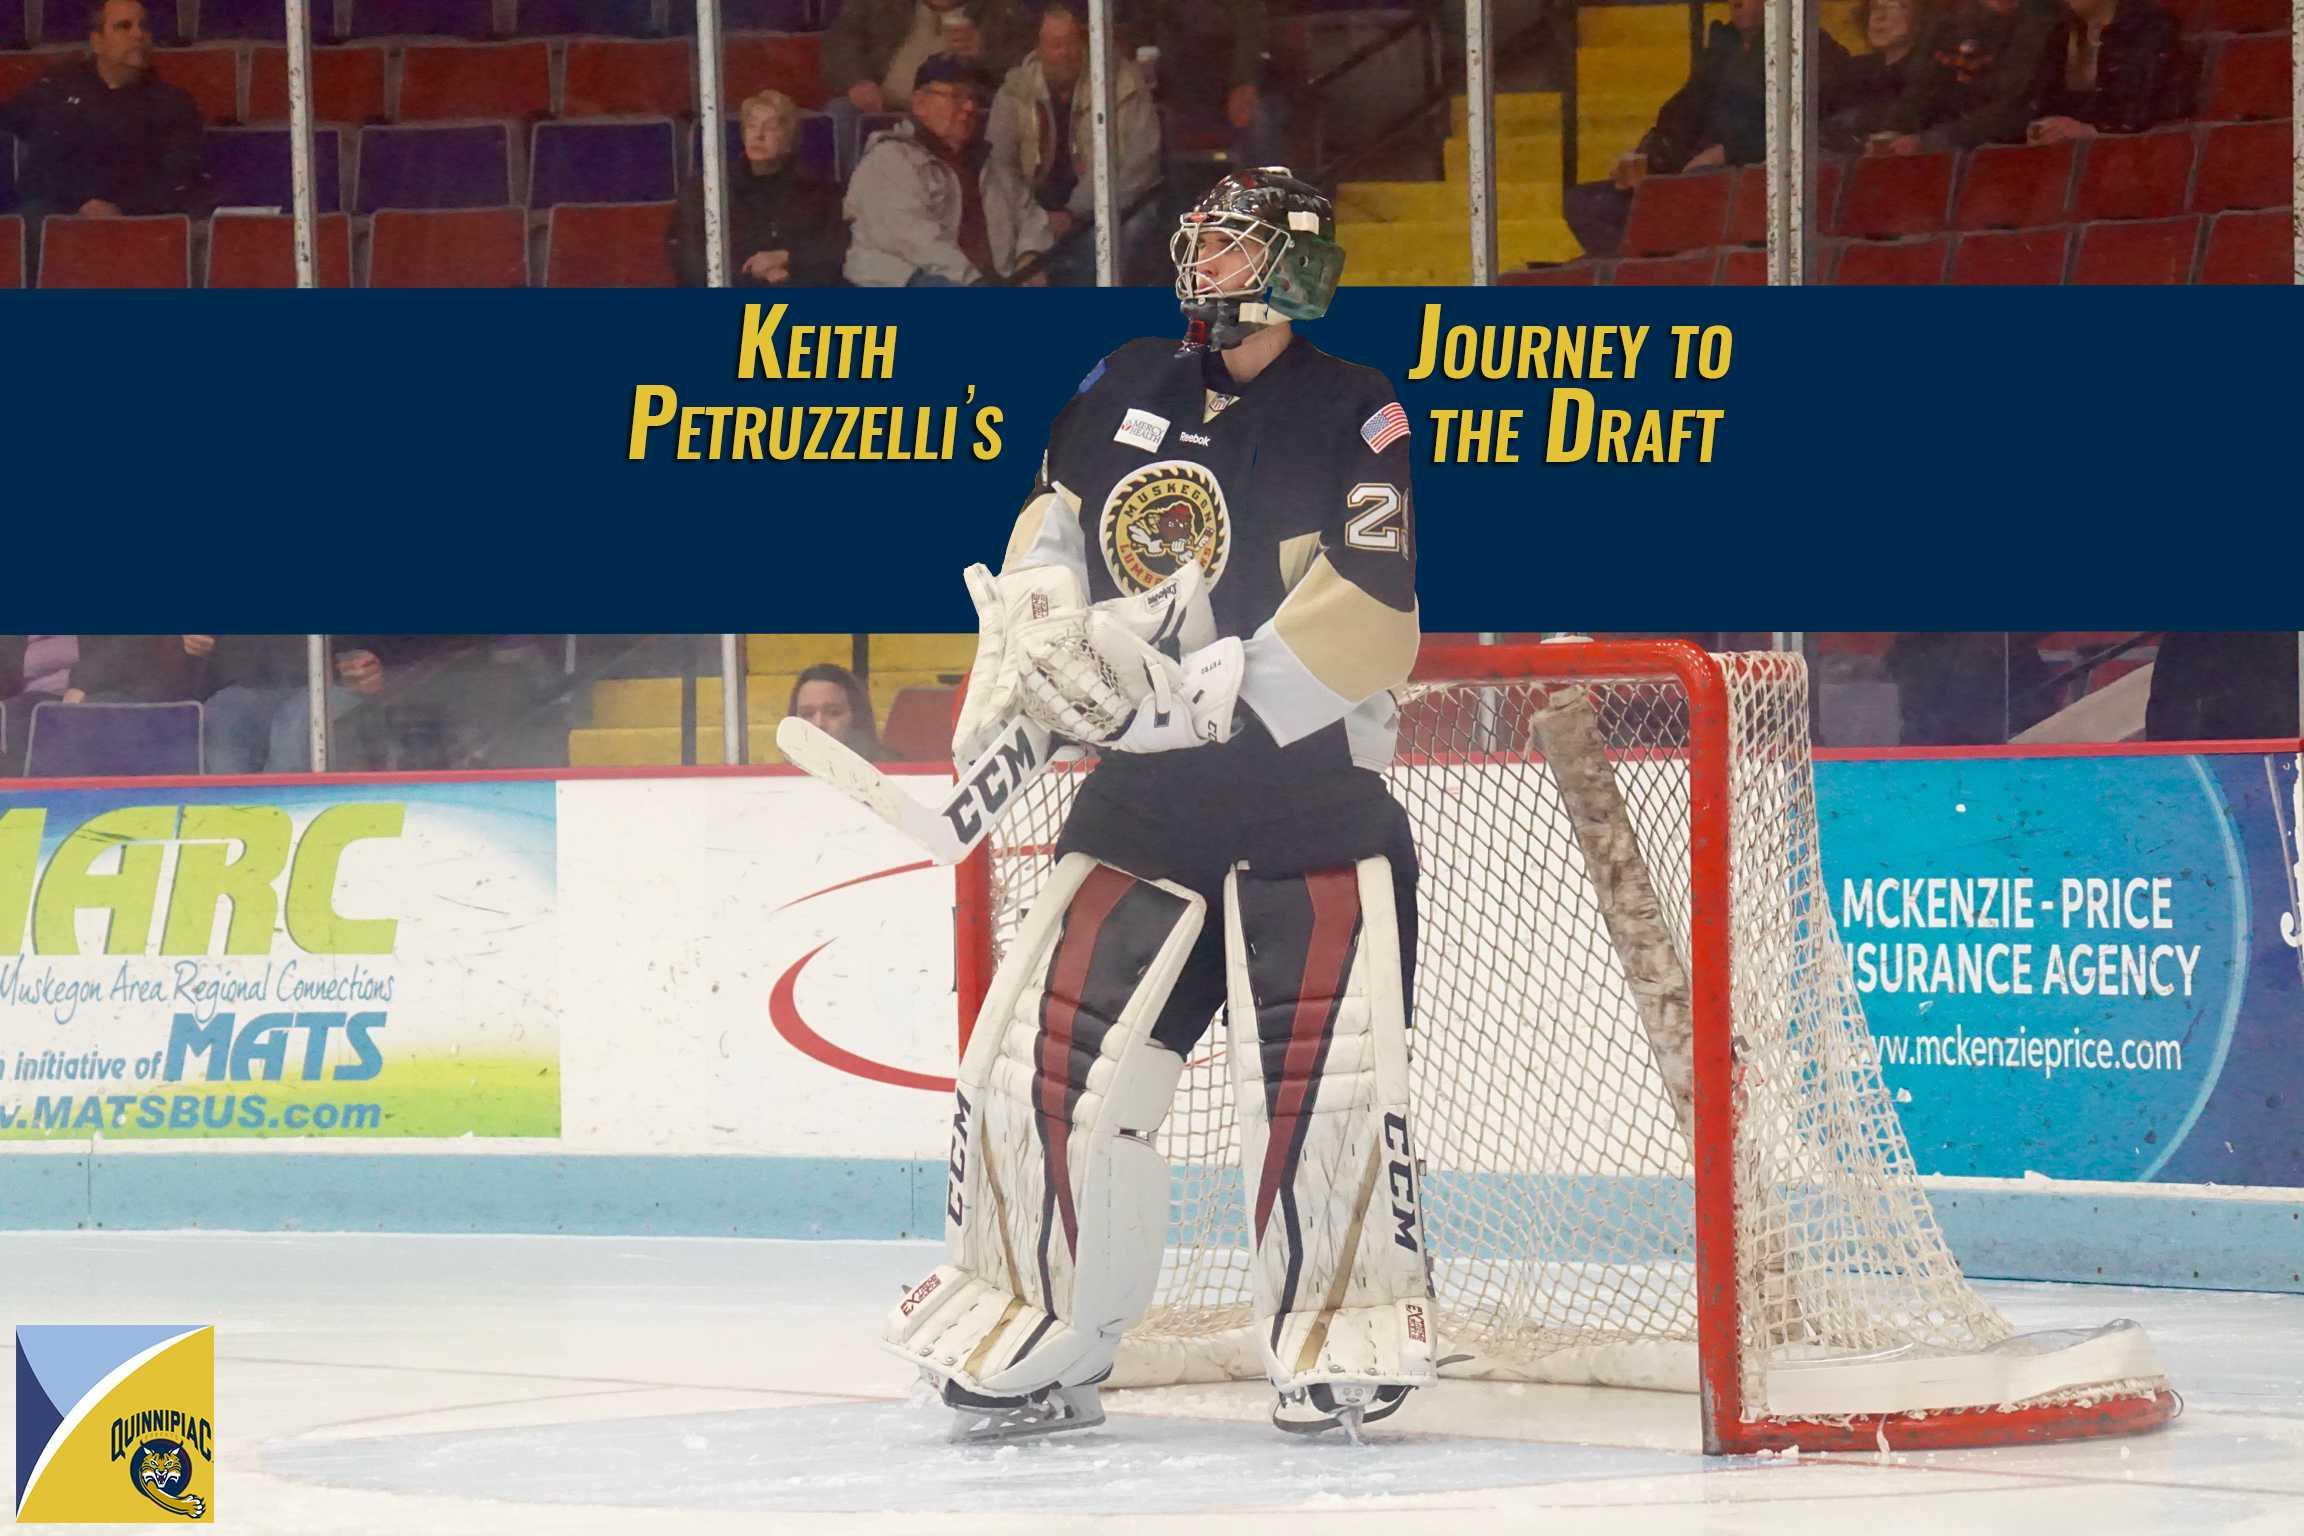 Keith Petruzzelli: Journey to the Draft